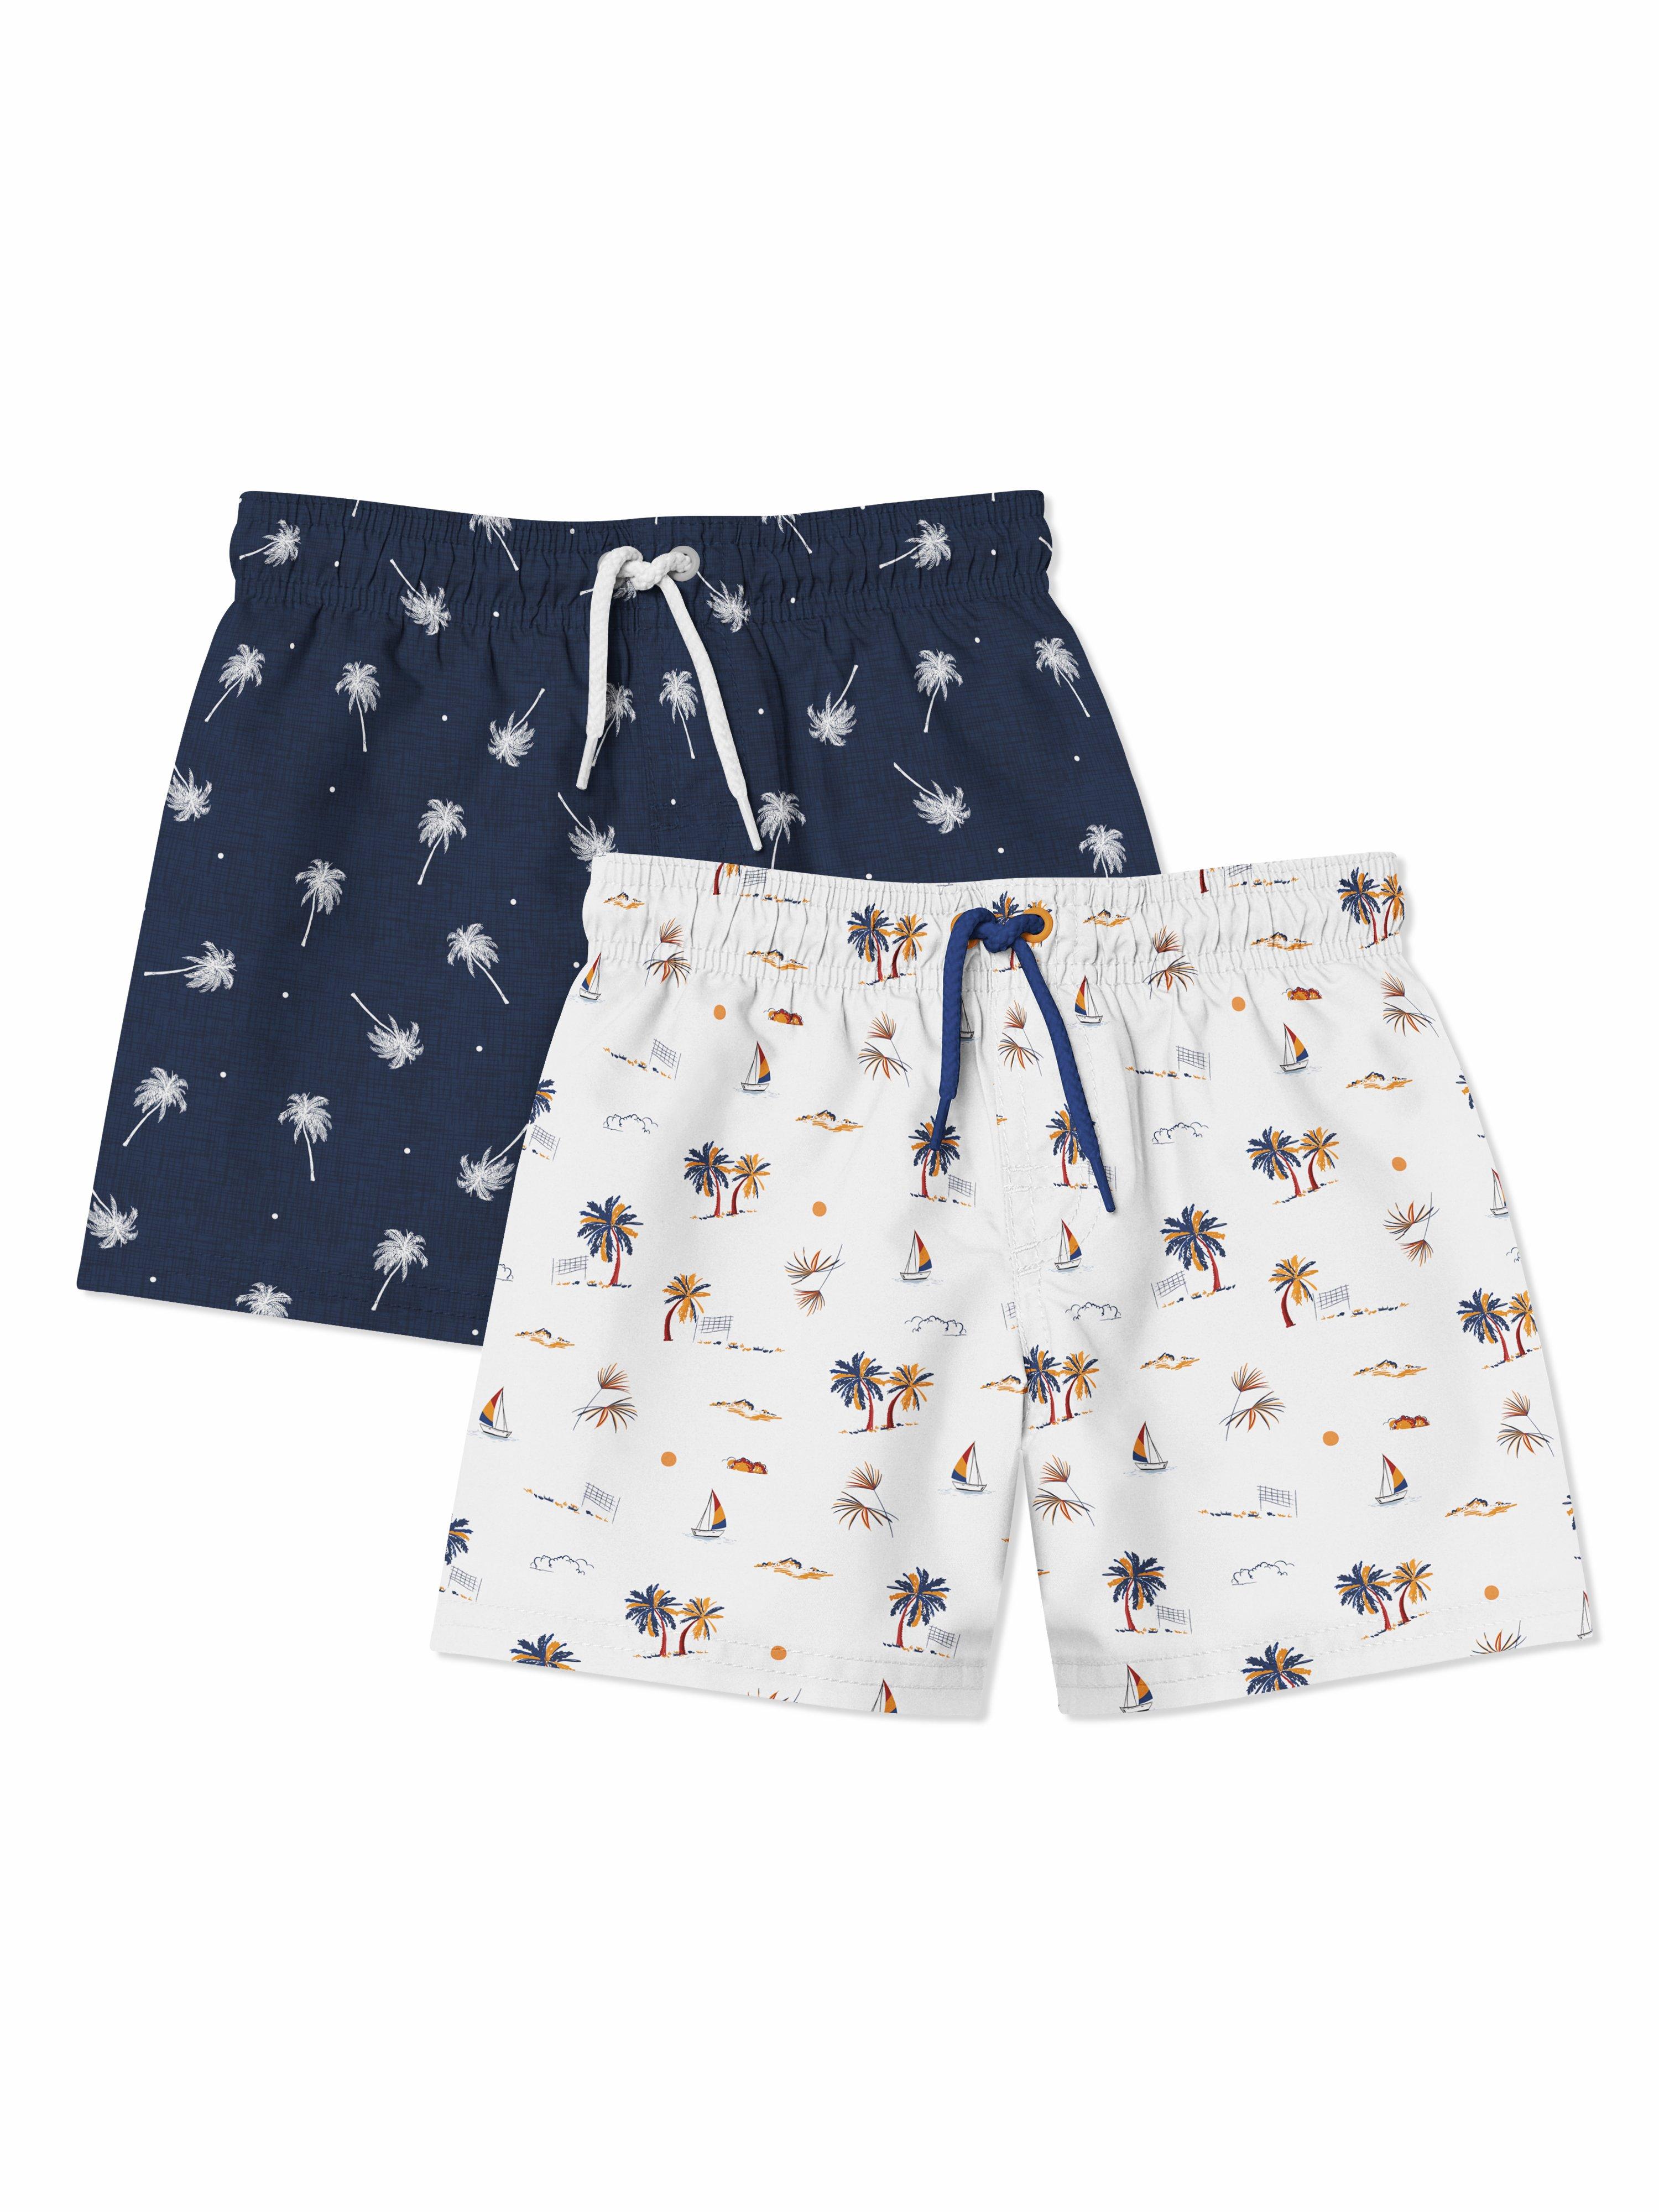 婴儿游泳短裤裤衩印花图案设计展示样机套装 Baby Swimming Shorts Mockups Set插图(4)